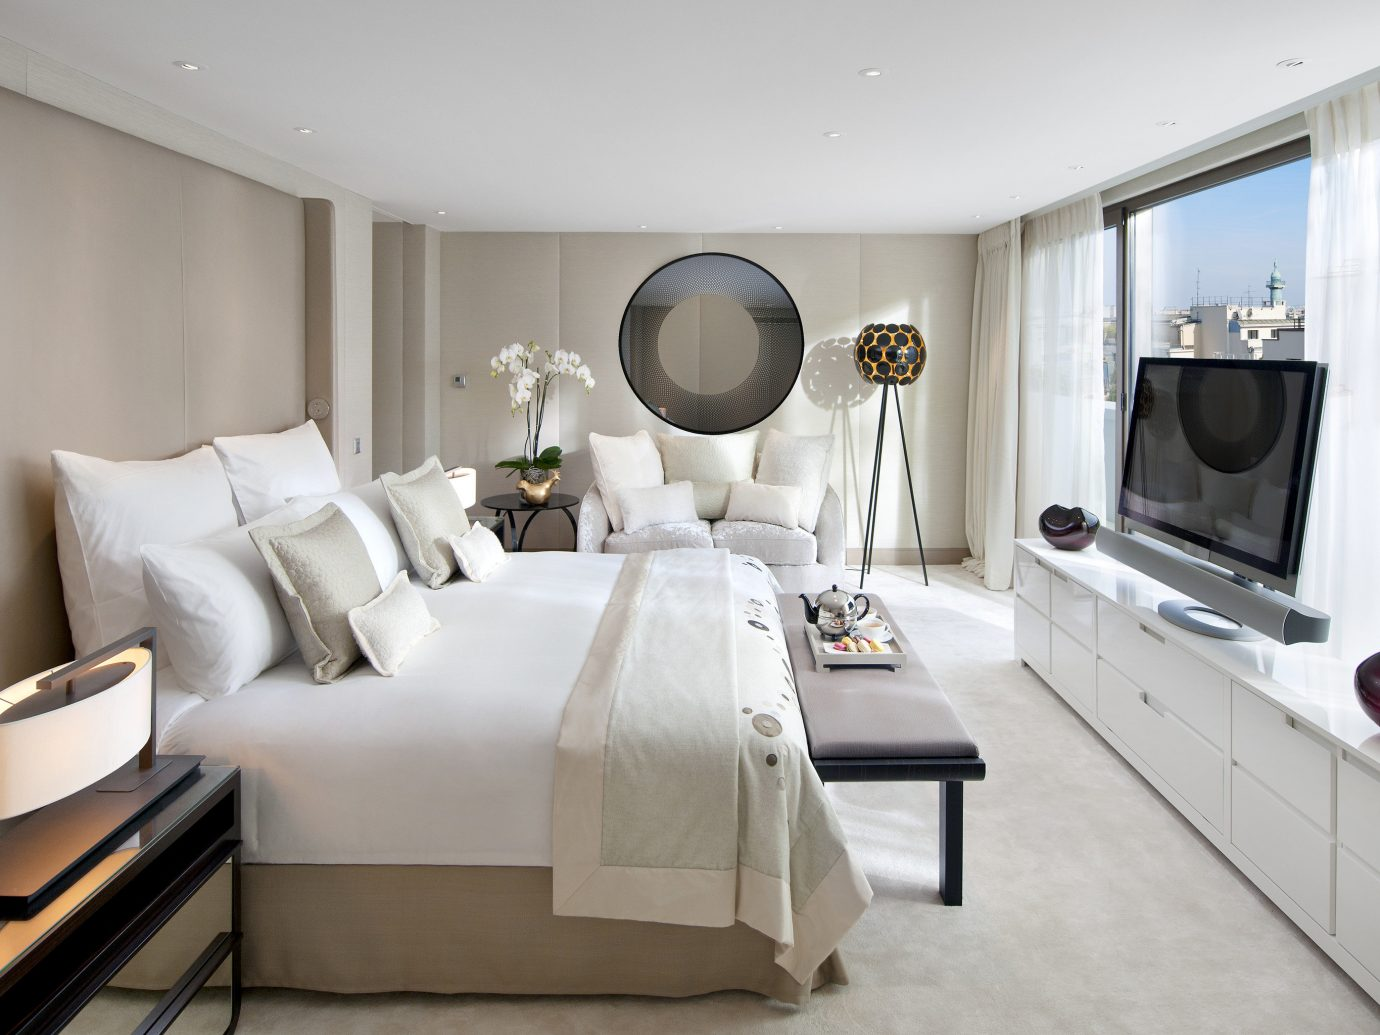 Hotels Luxury Travel indoor wall floor ceiling room Living interior design Suite furniture living room Bedroom interior designer area Modern